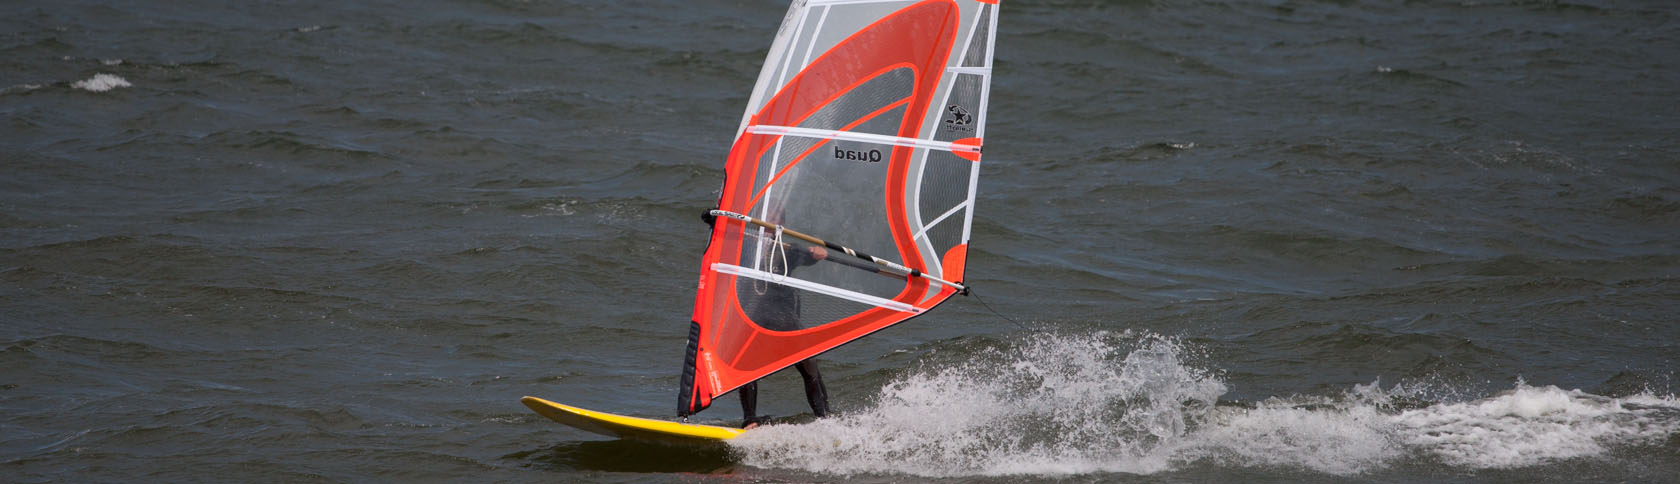 vindsurfing-surfing-skåne